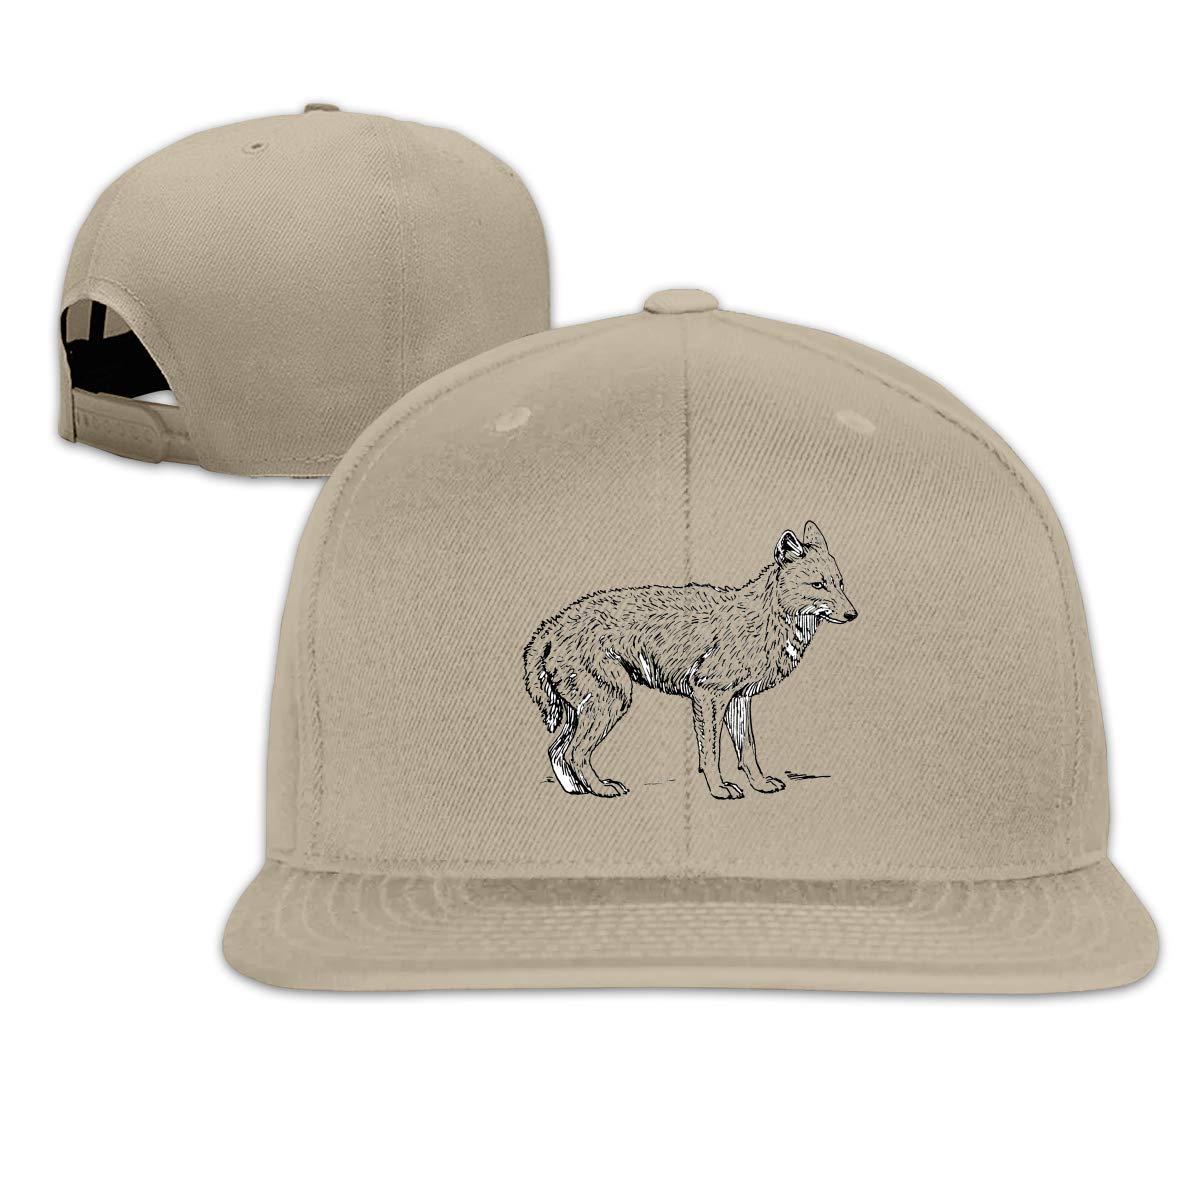 Xieadery Jackal Flat Brim Baseball Cap Adjustable Snapback Trucker Hat Caps Hip Hop Hat